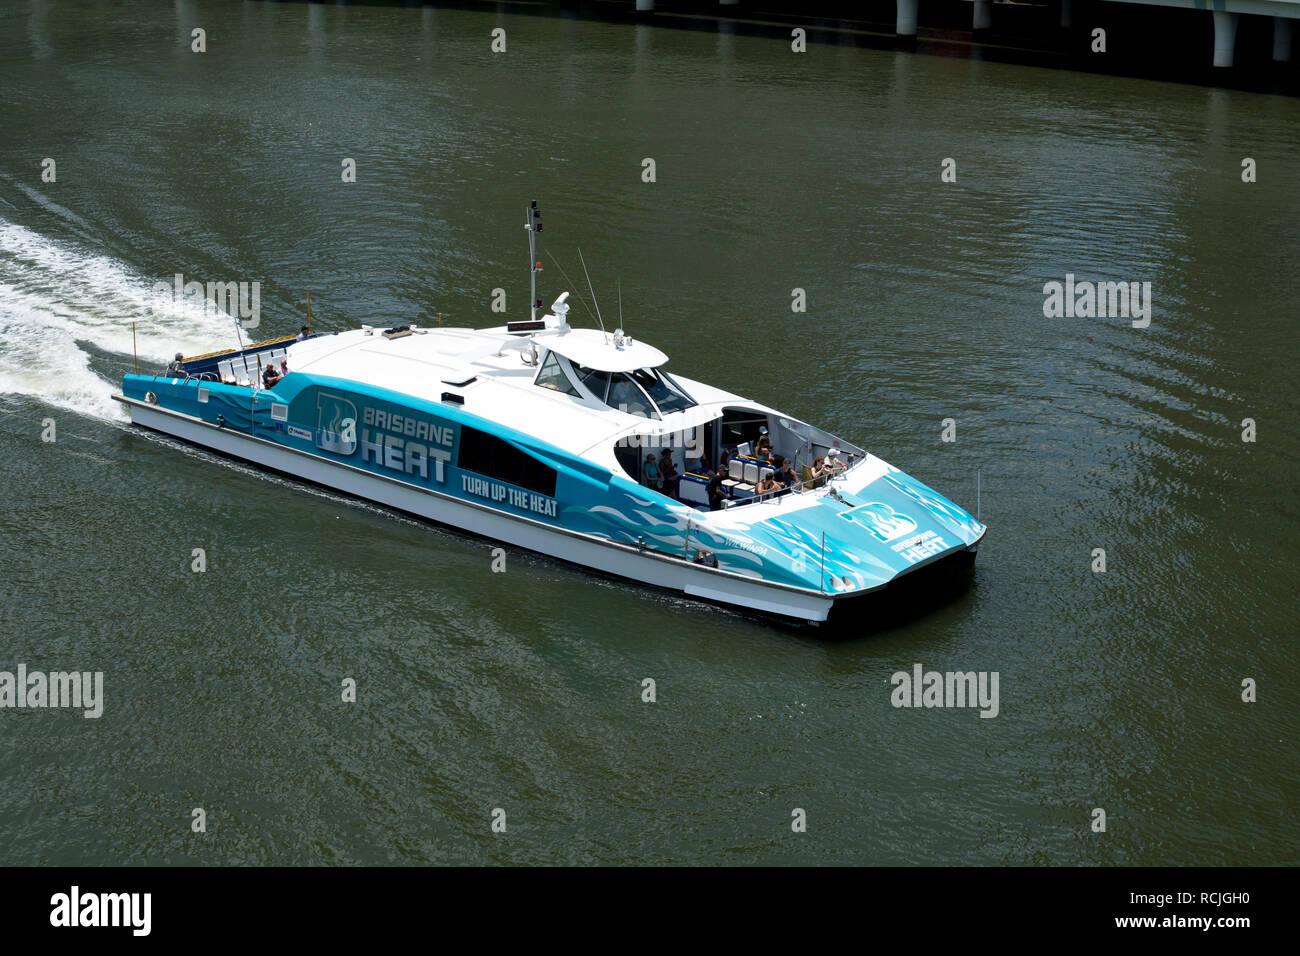 A CityCat catamaran on the Brisbane River, Brisbane, Queensland, Australia - Stock Image